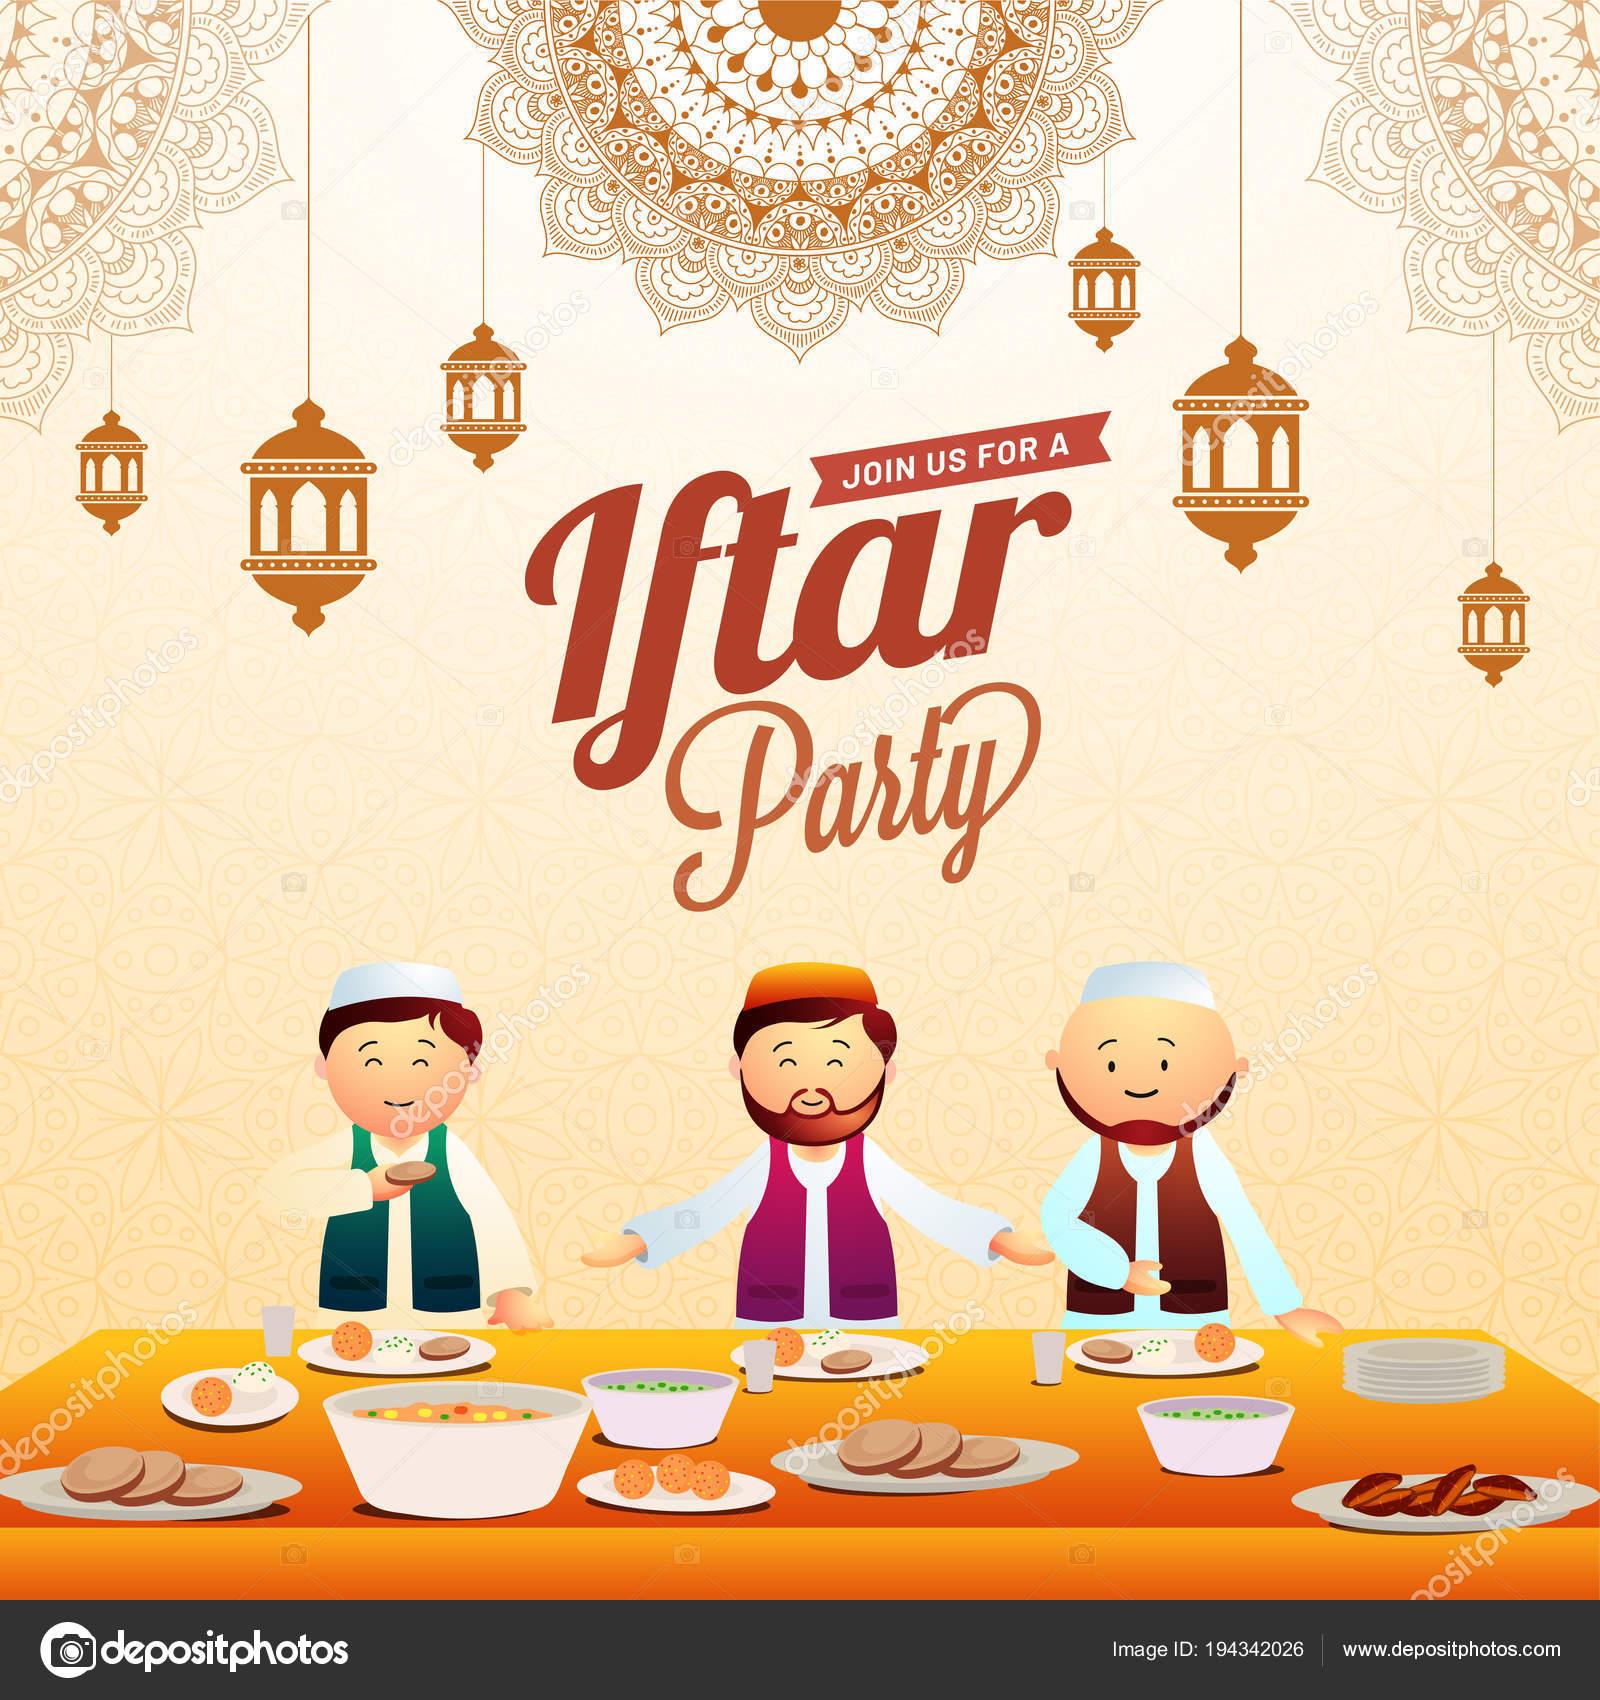 Iftar Party Invitation Card Desig Hanging Lanterns Mandala